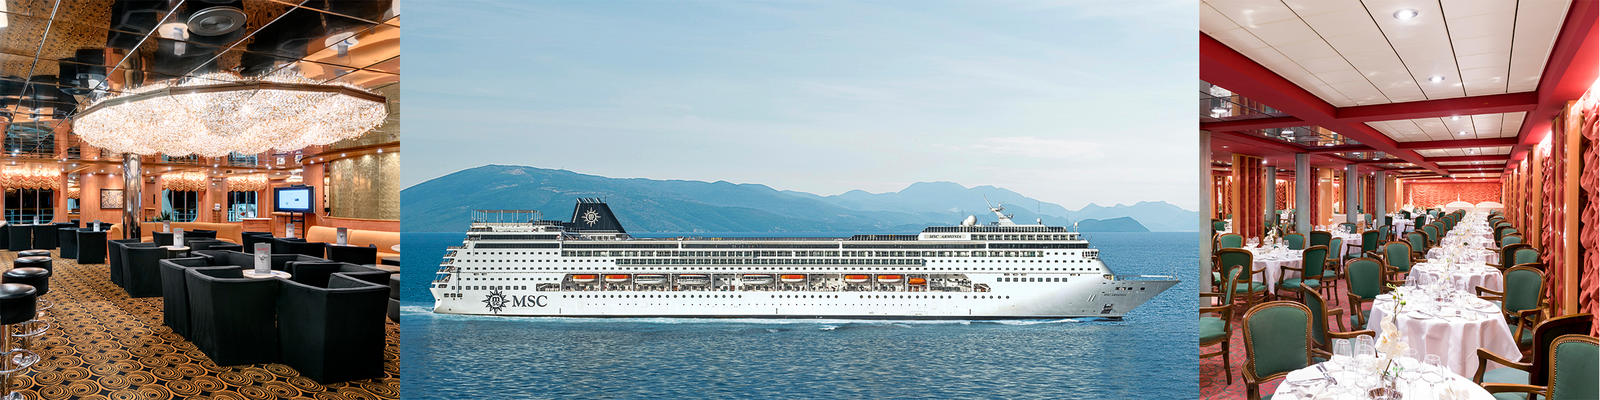 MSC Armonia Cruise Ship Review Photos On Cruise Critic - Msc armonia